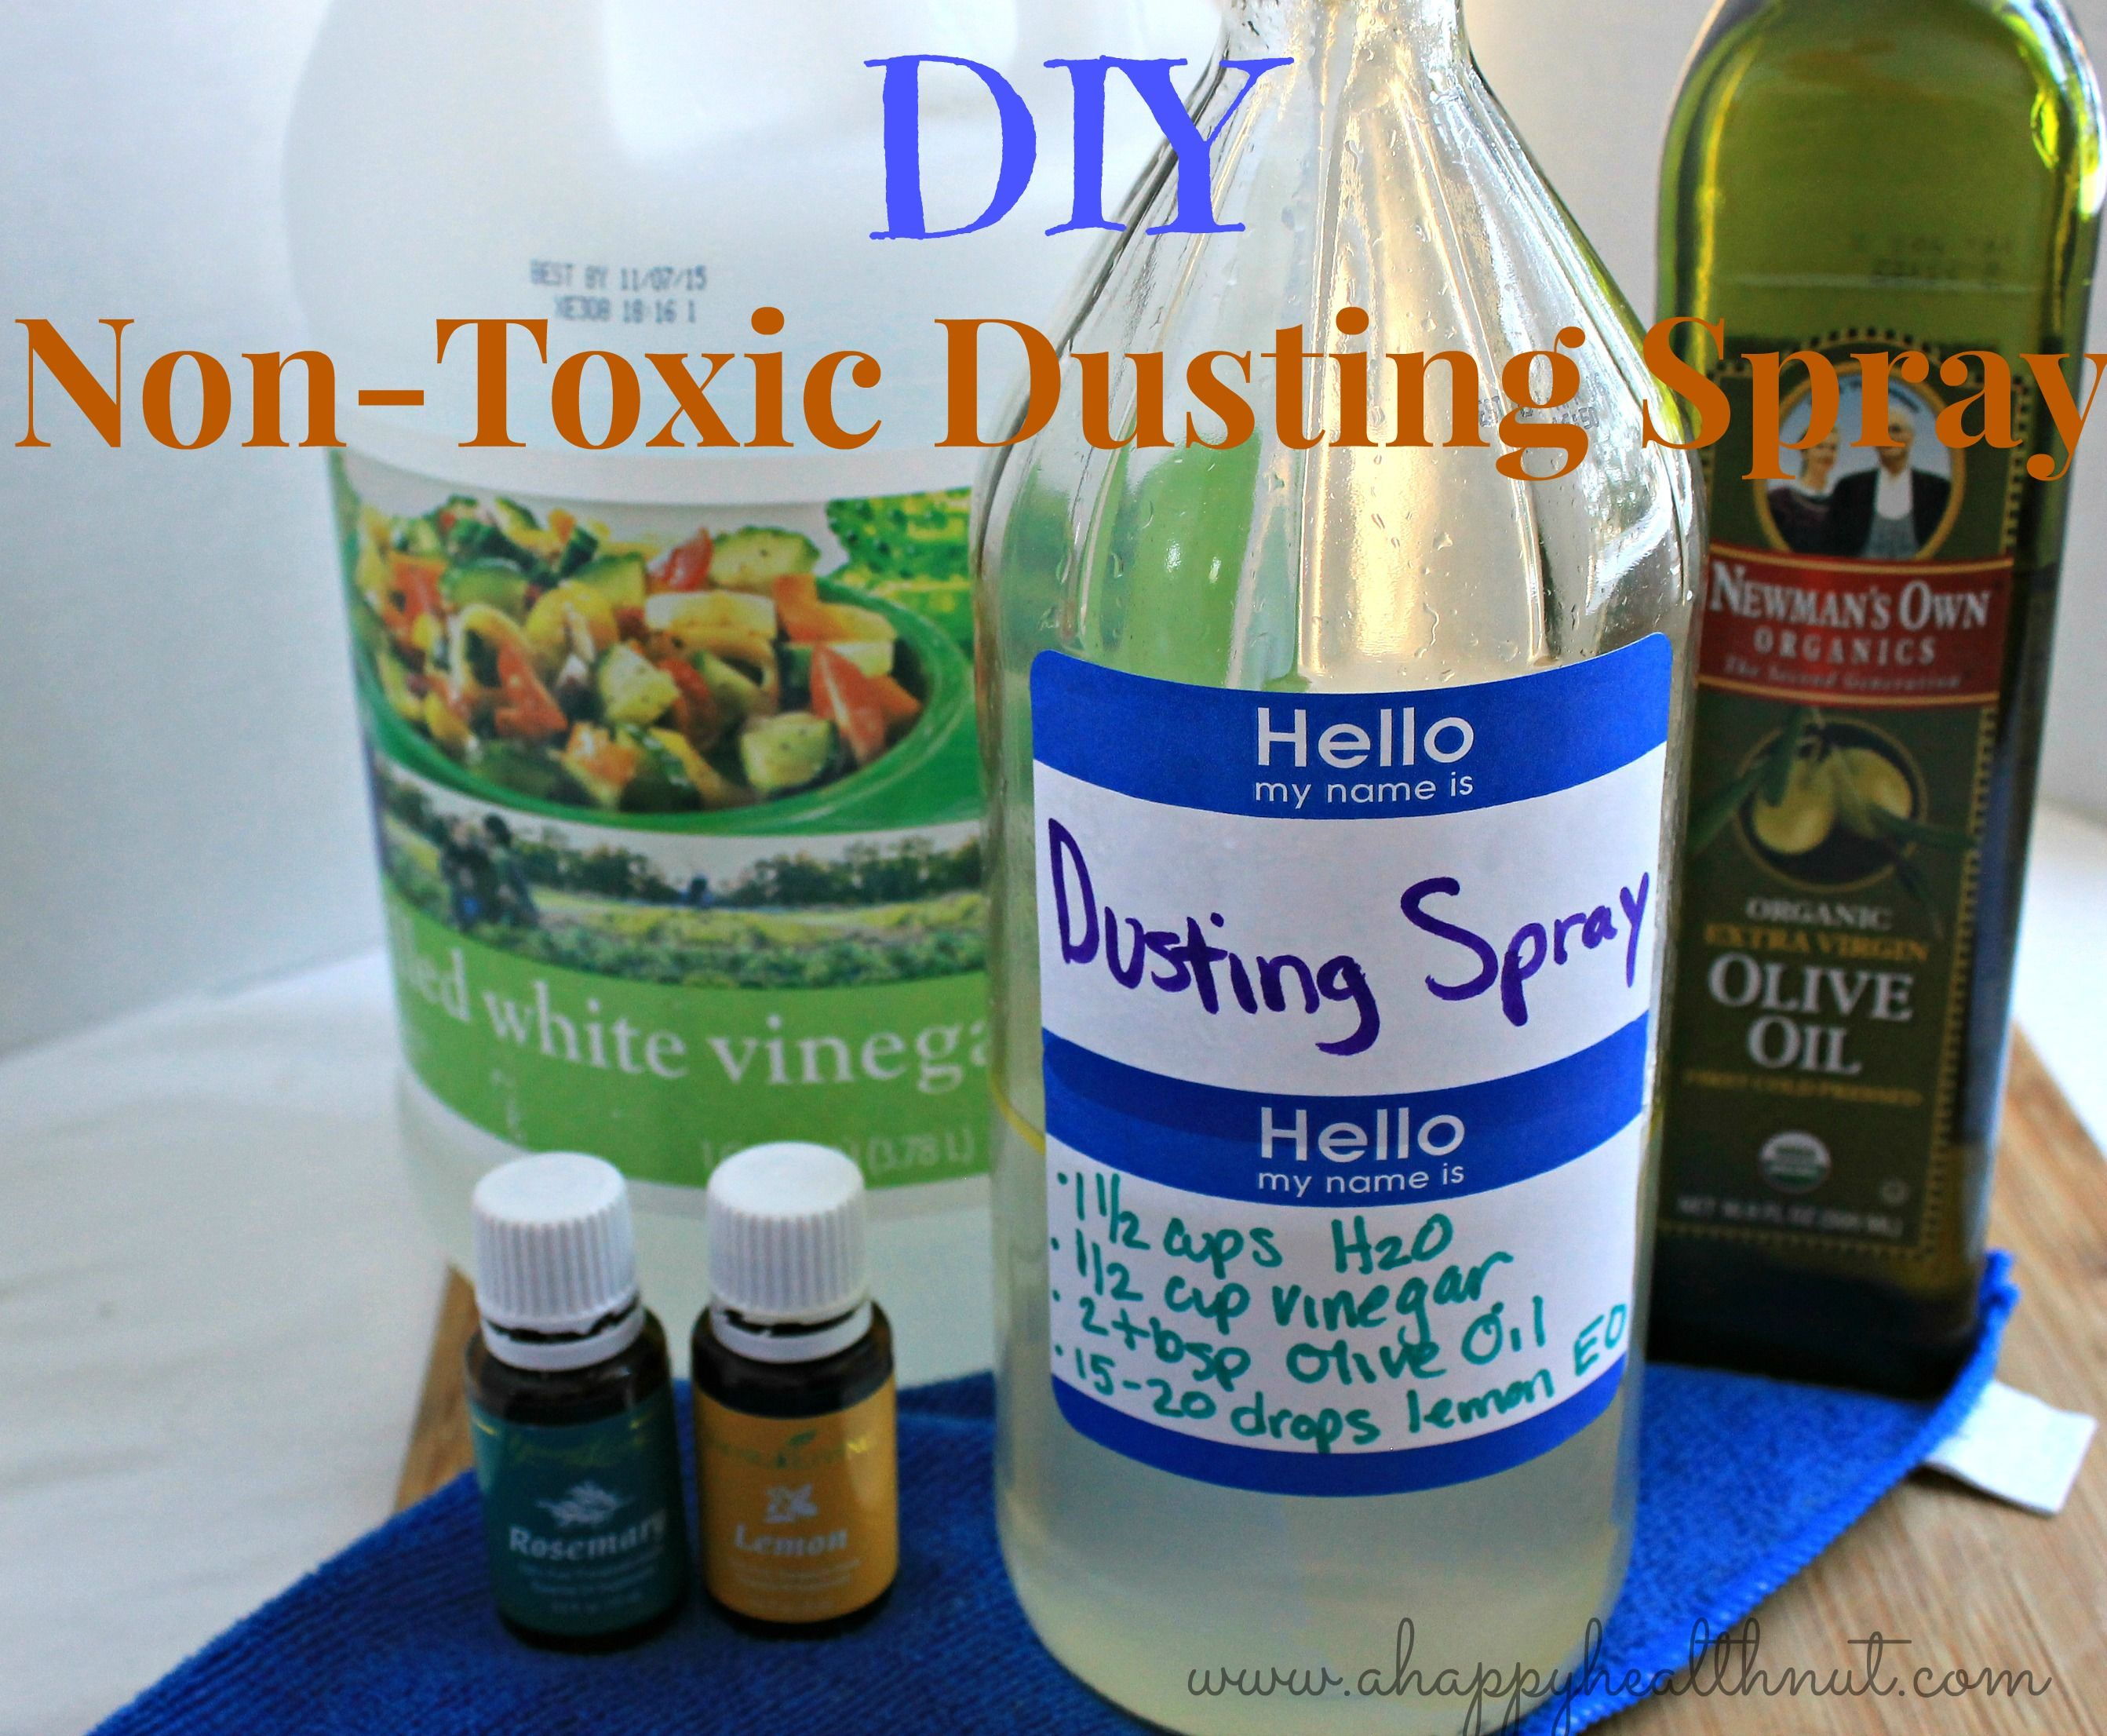 diy non toxic dusting spray kosmetik kosmetik. Black Bedroom Furniture Sets. Home Design Ideas